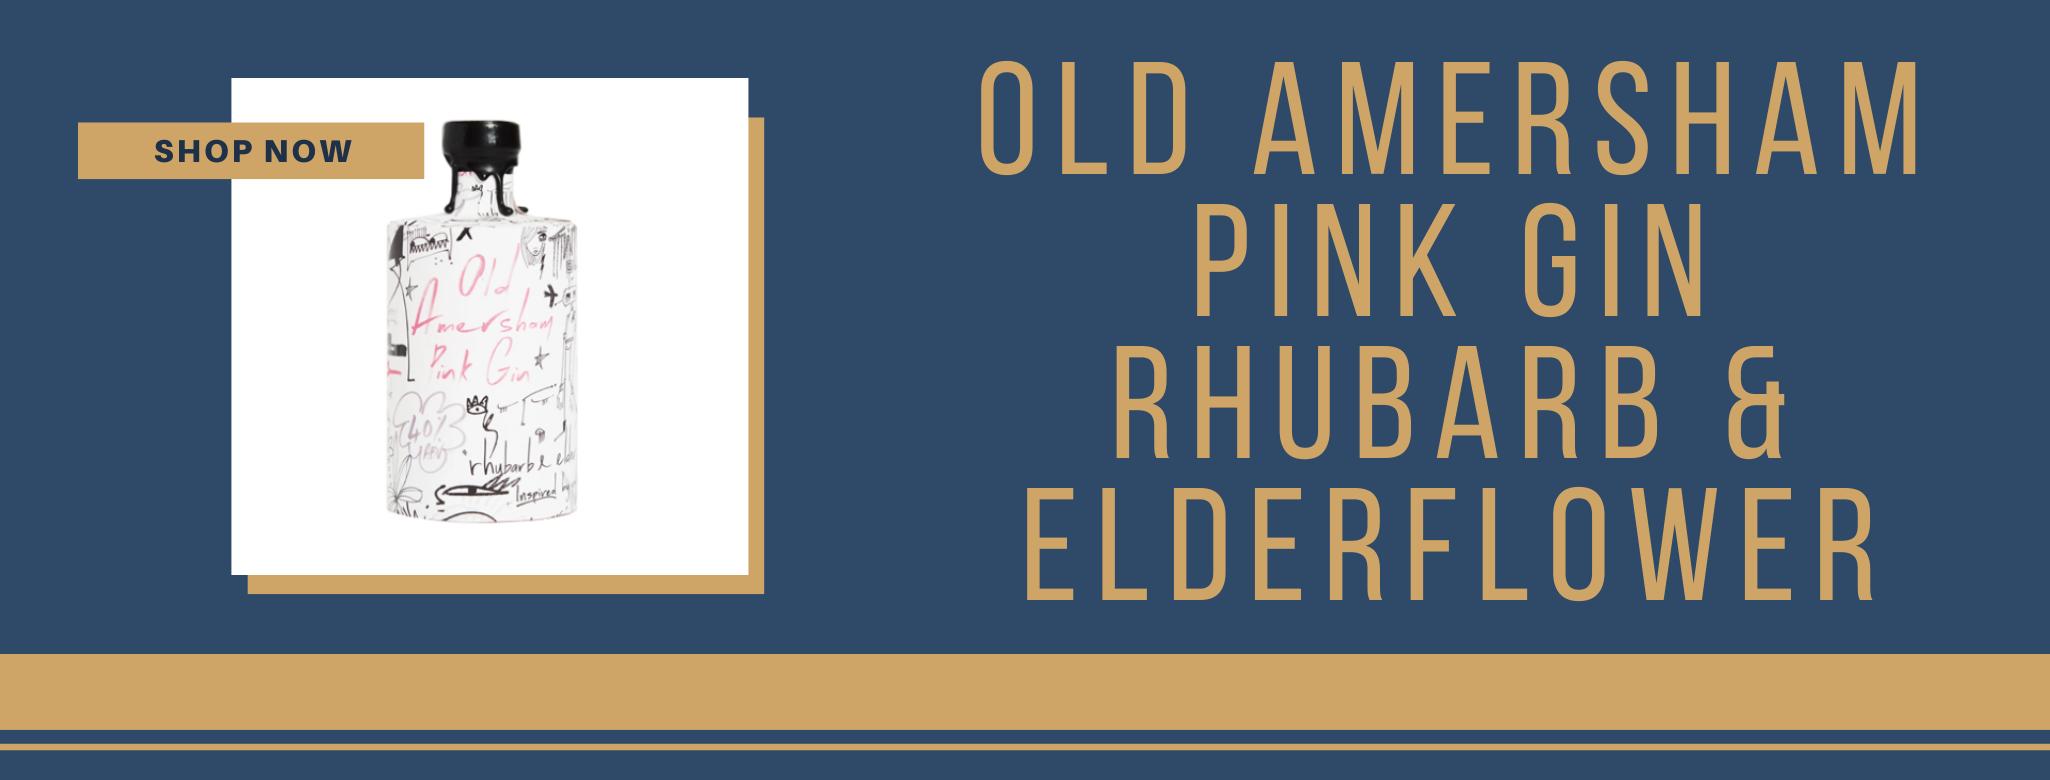 Buy Old Amersham pink gin online